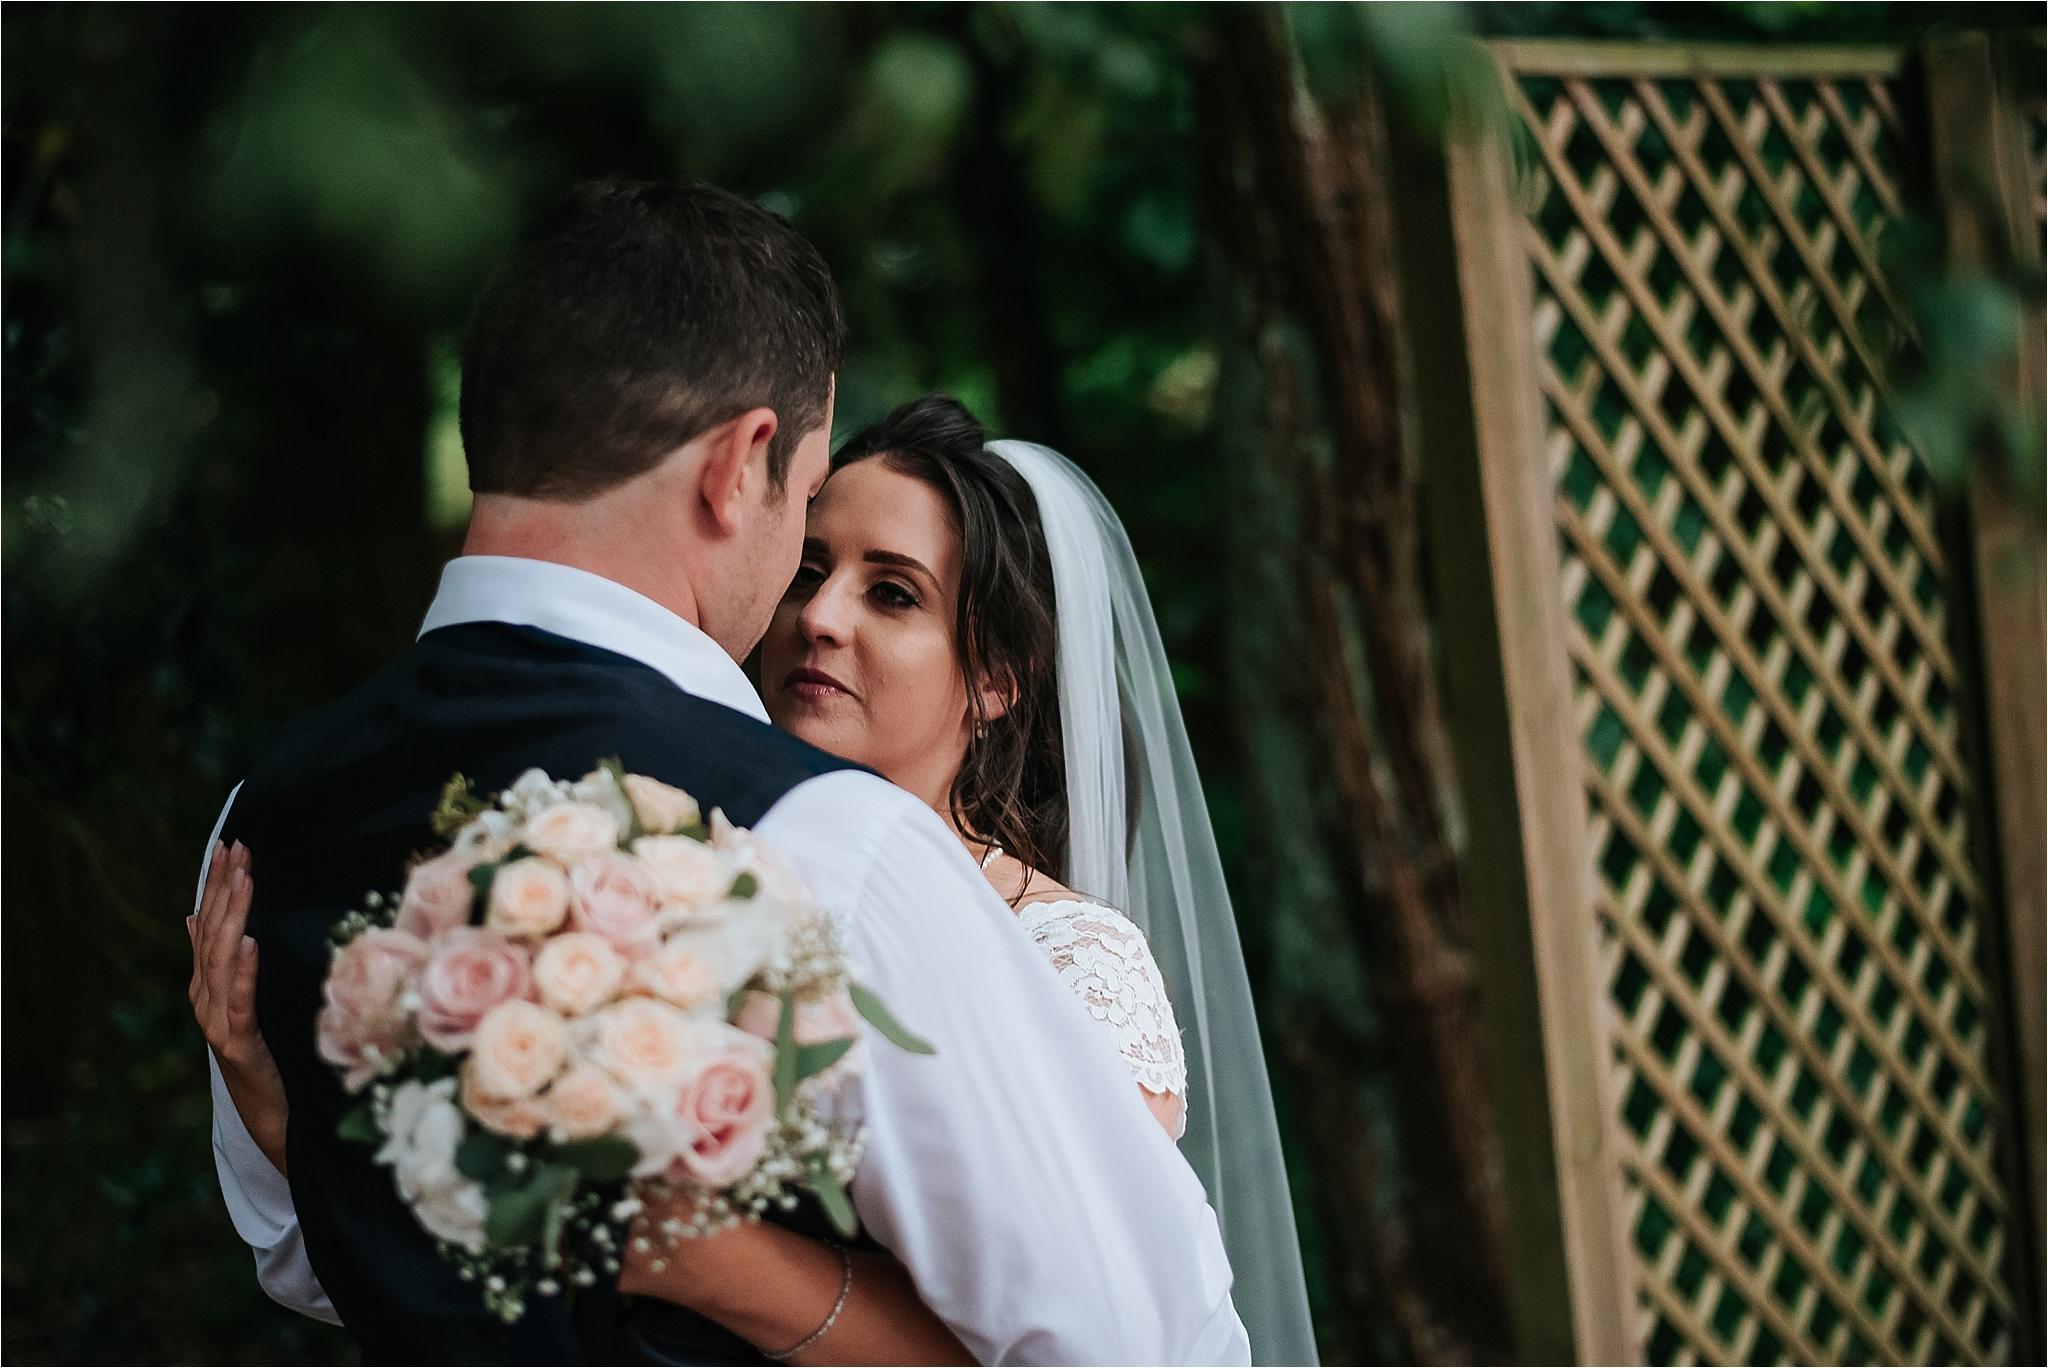 thevilla+lancashire+wreagreen+wedding+photographer65.jpg